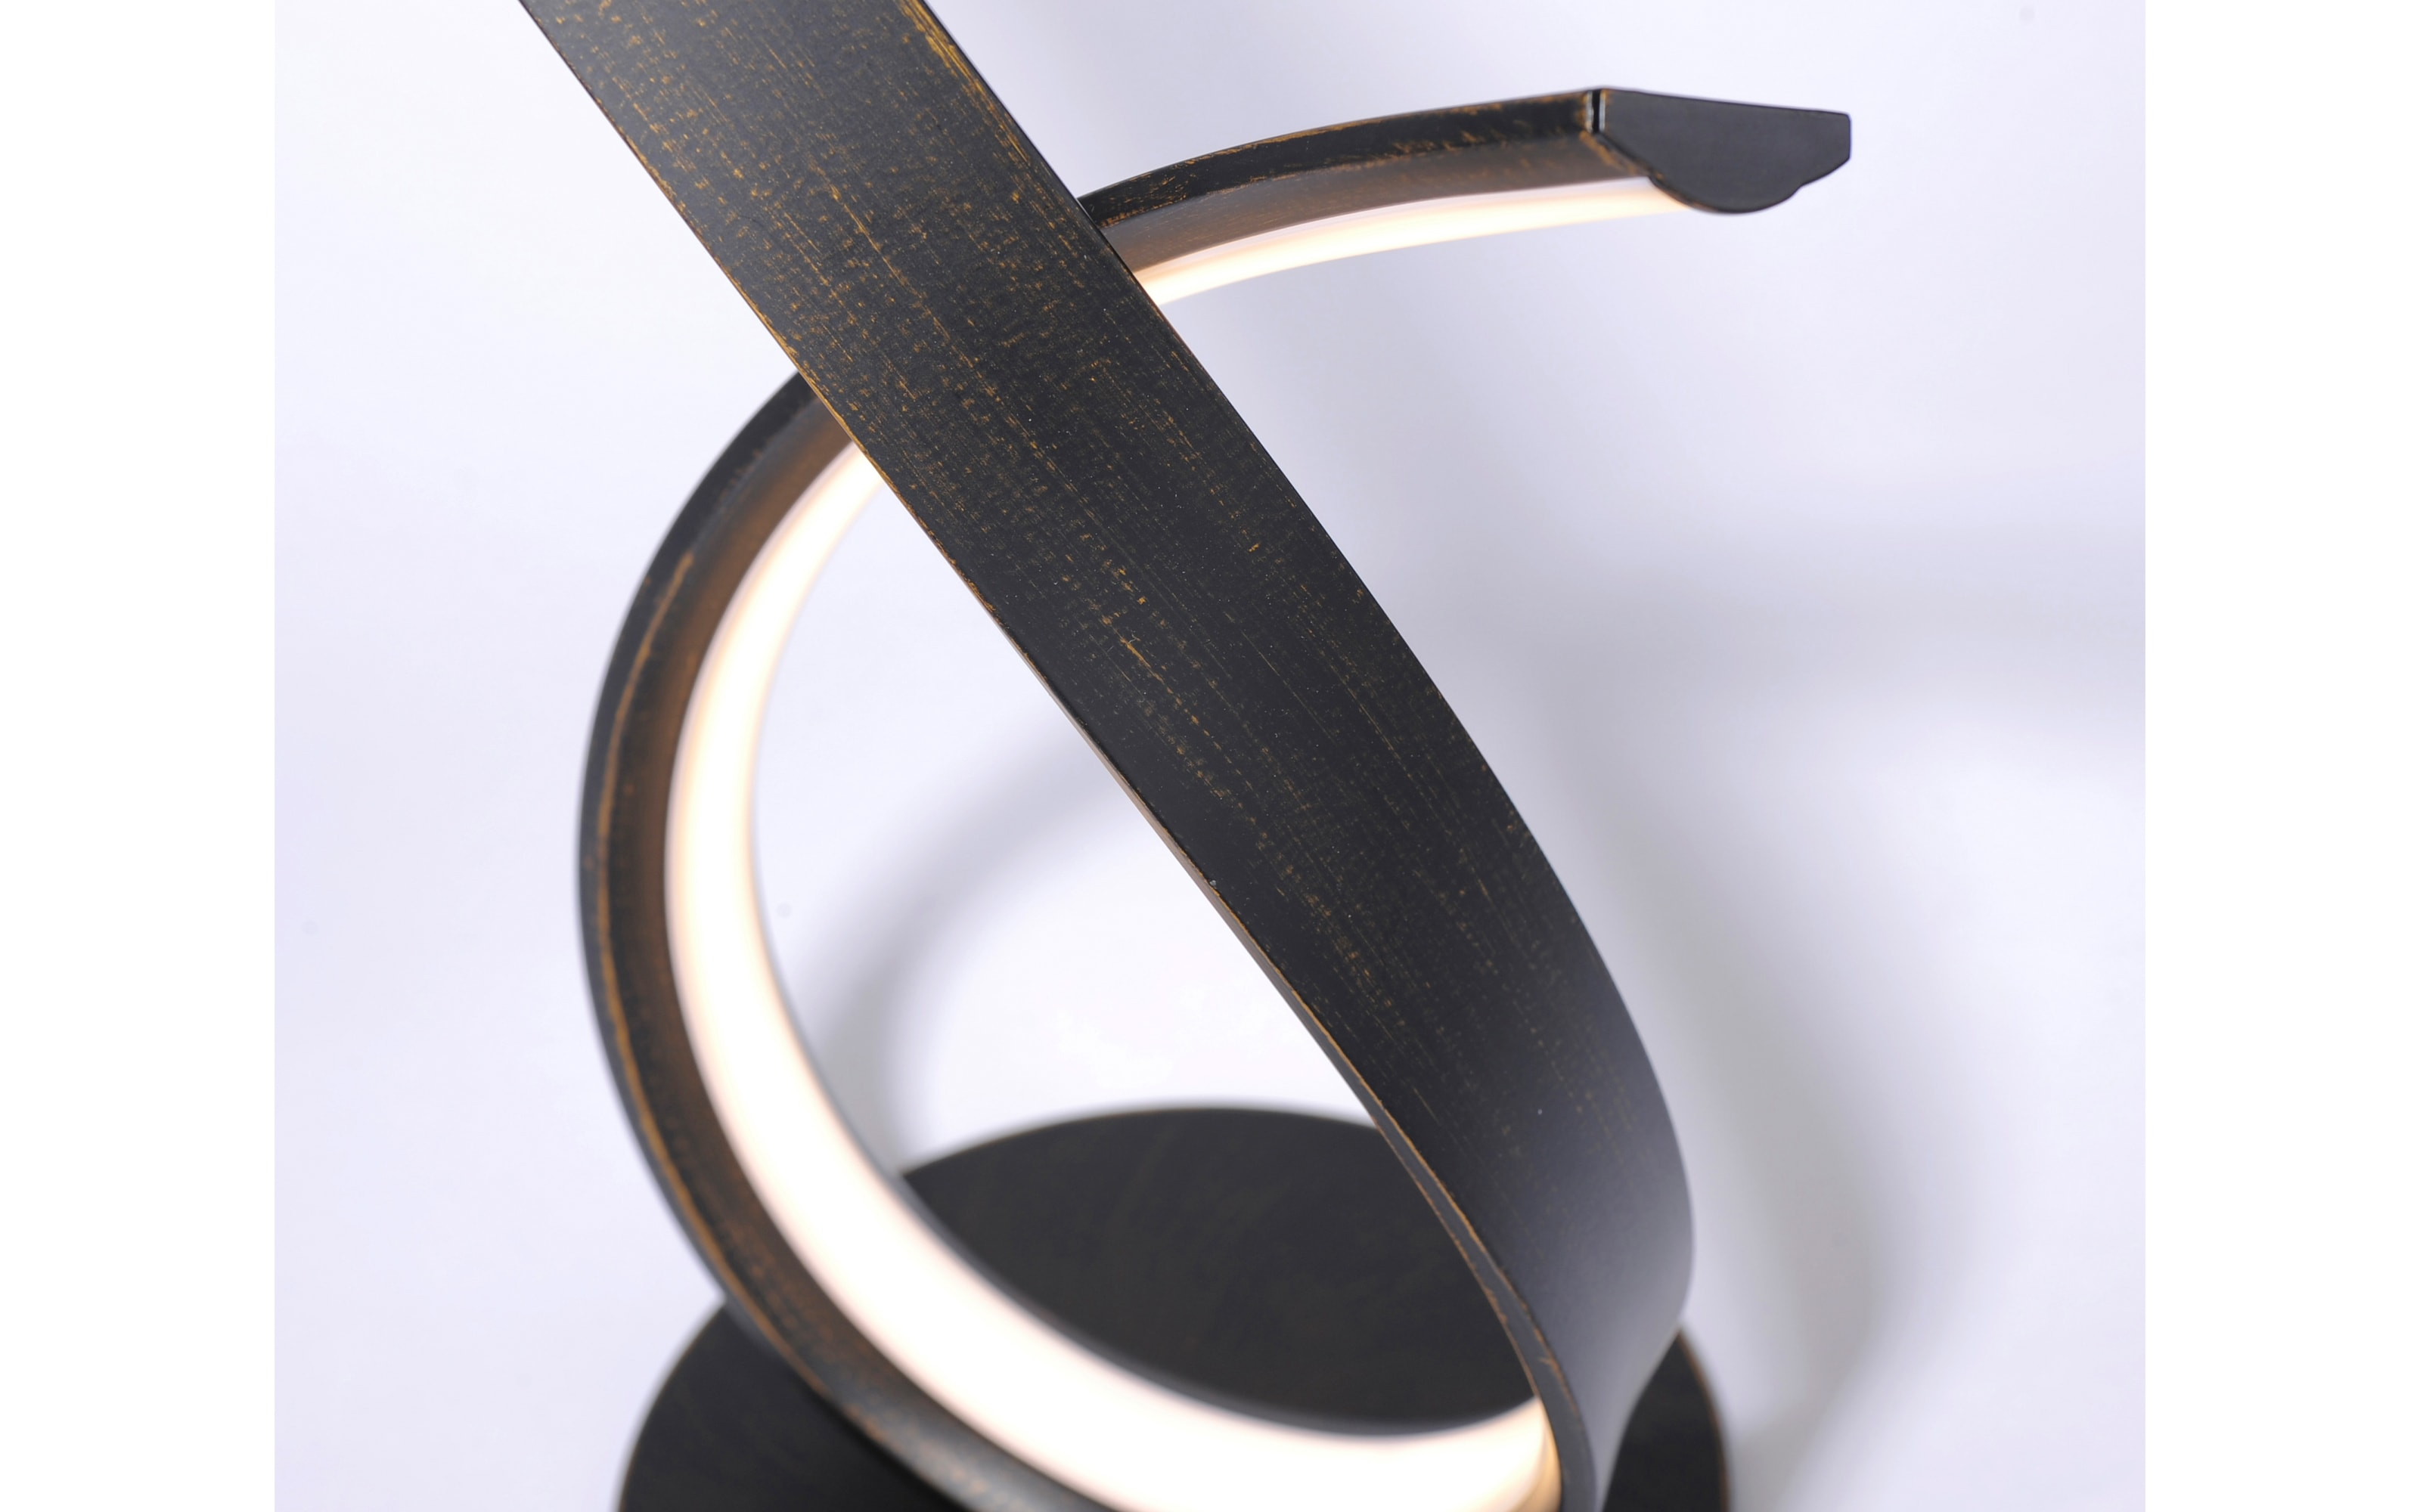 LED-Tischleuchte Linda in rostfarbig, 40 cm